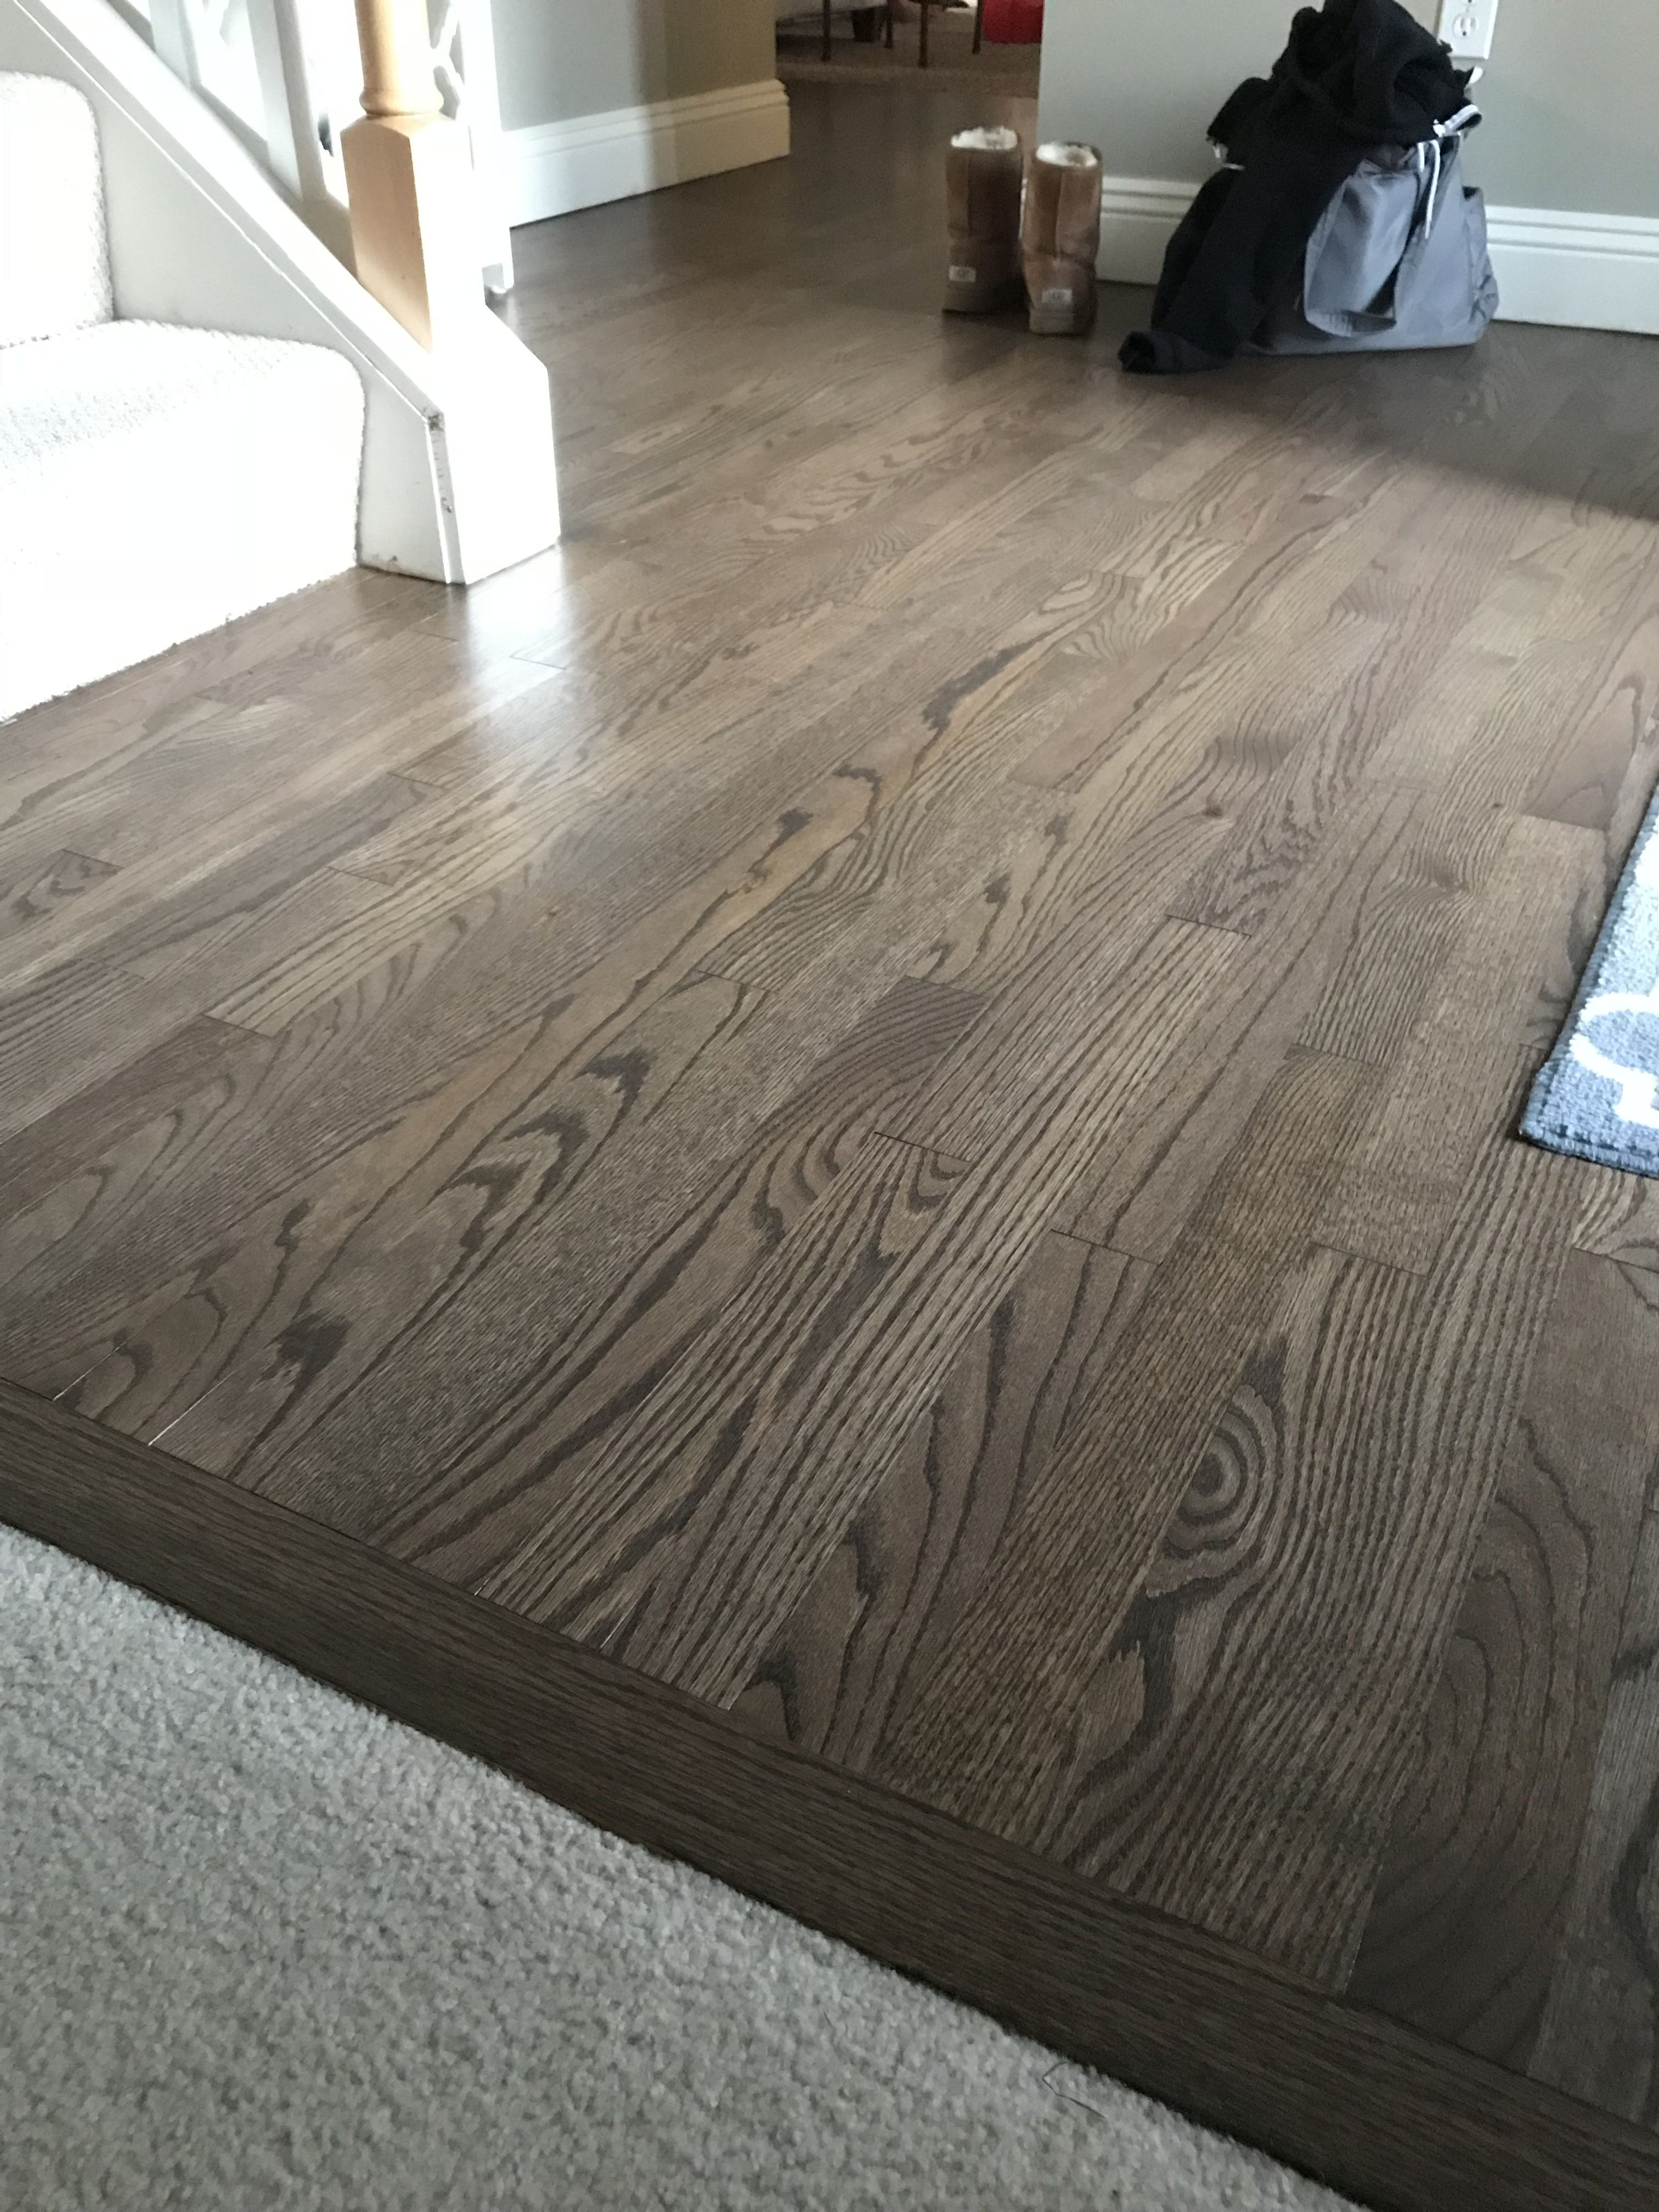 Hardwood Floors Refinished In Espresso